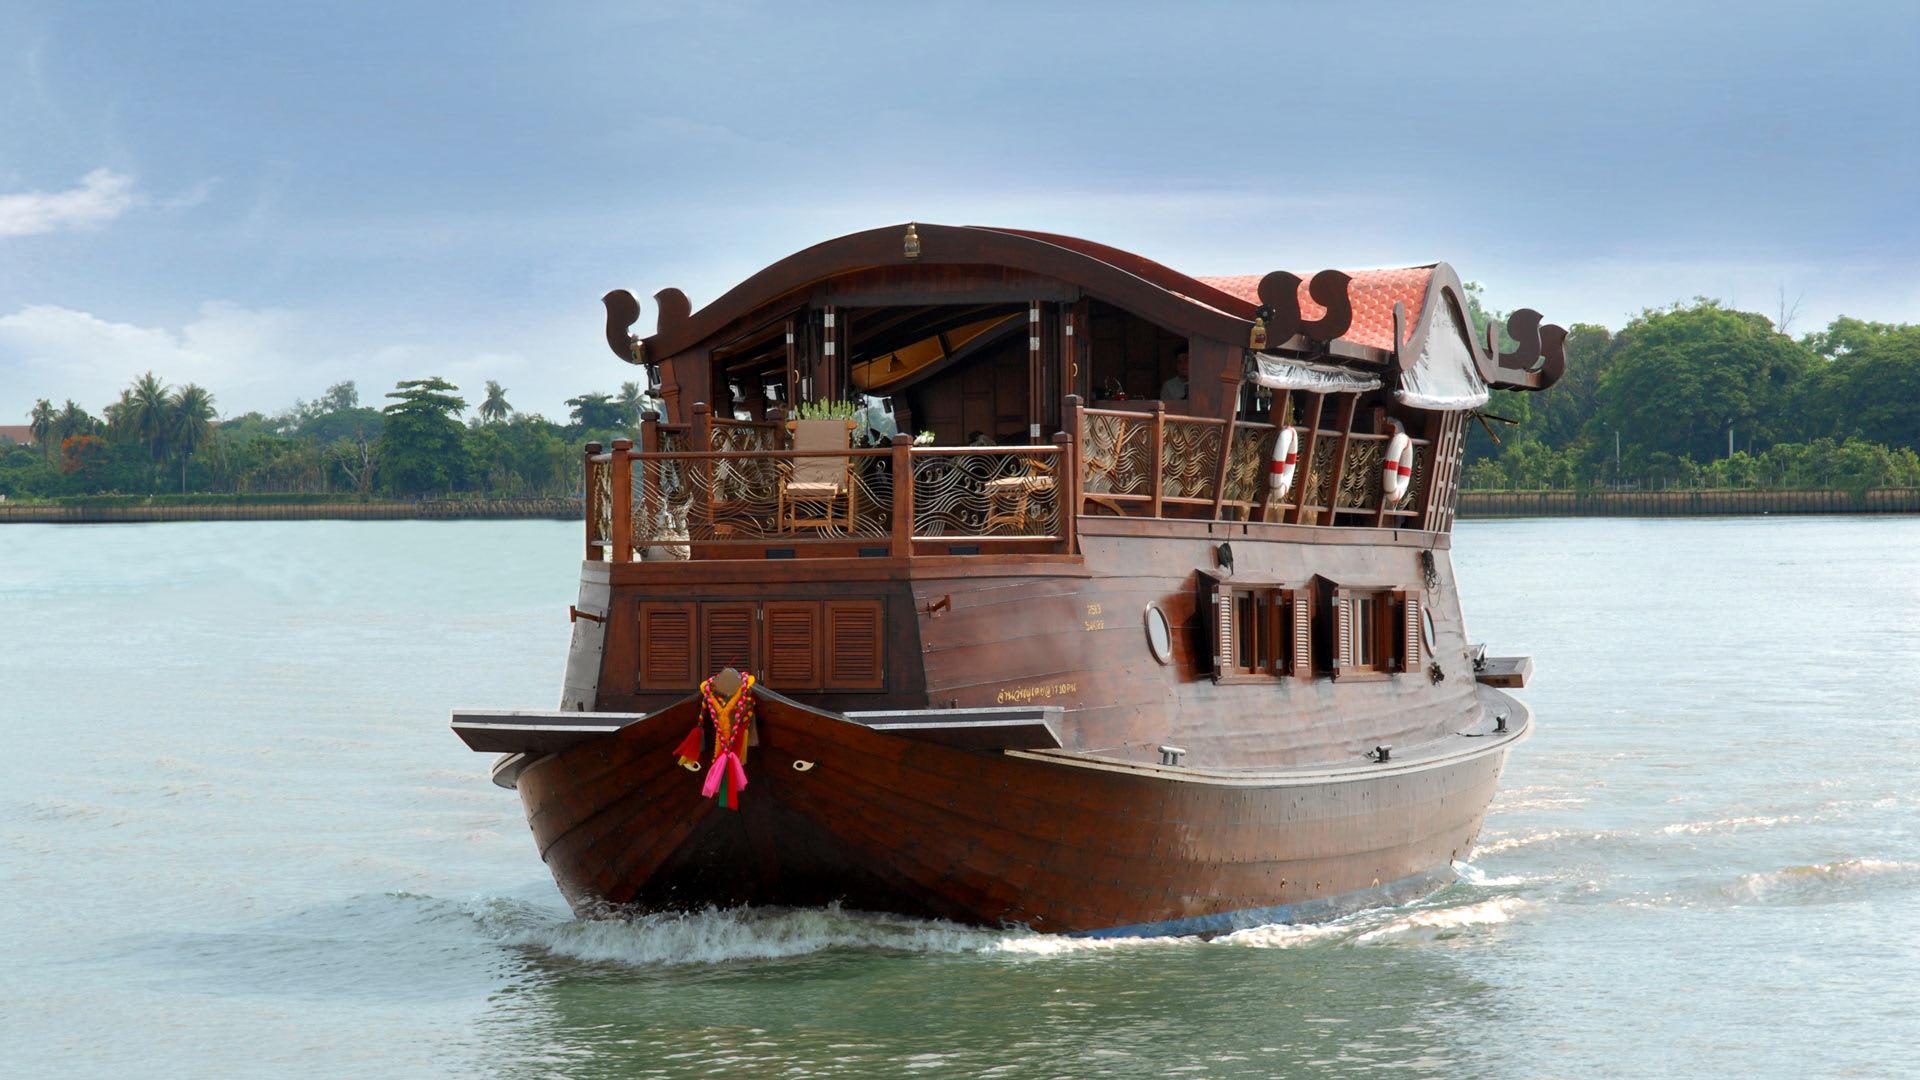 https://assets.anantara.com/image/upload/q_auto,f_auto/media/minor/anantara/images/anantara-cruises/the-resort/anantara_cruises_dream_header_1920x1080.jpg